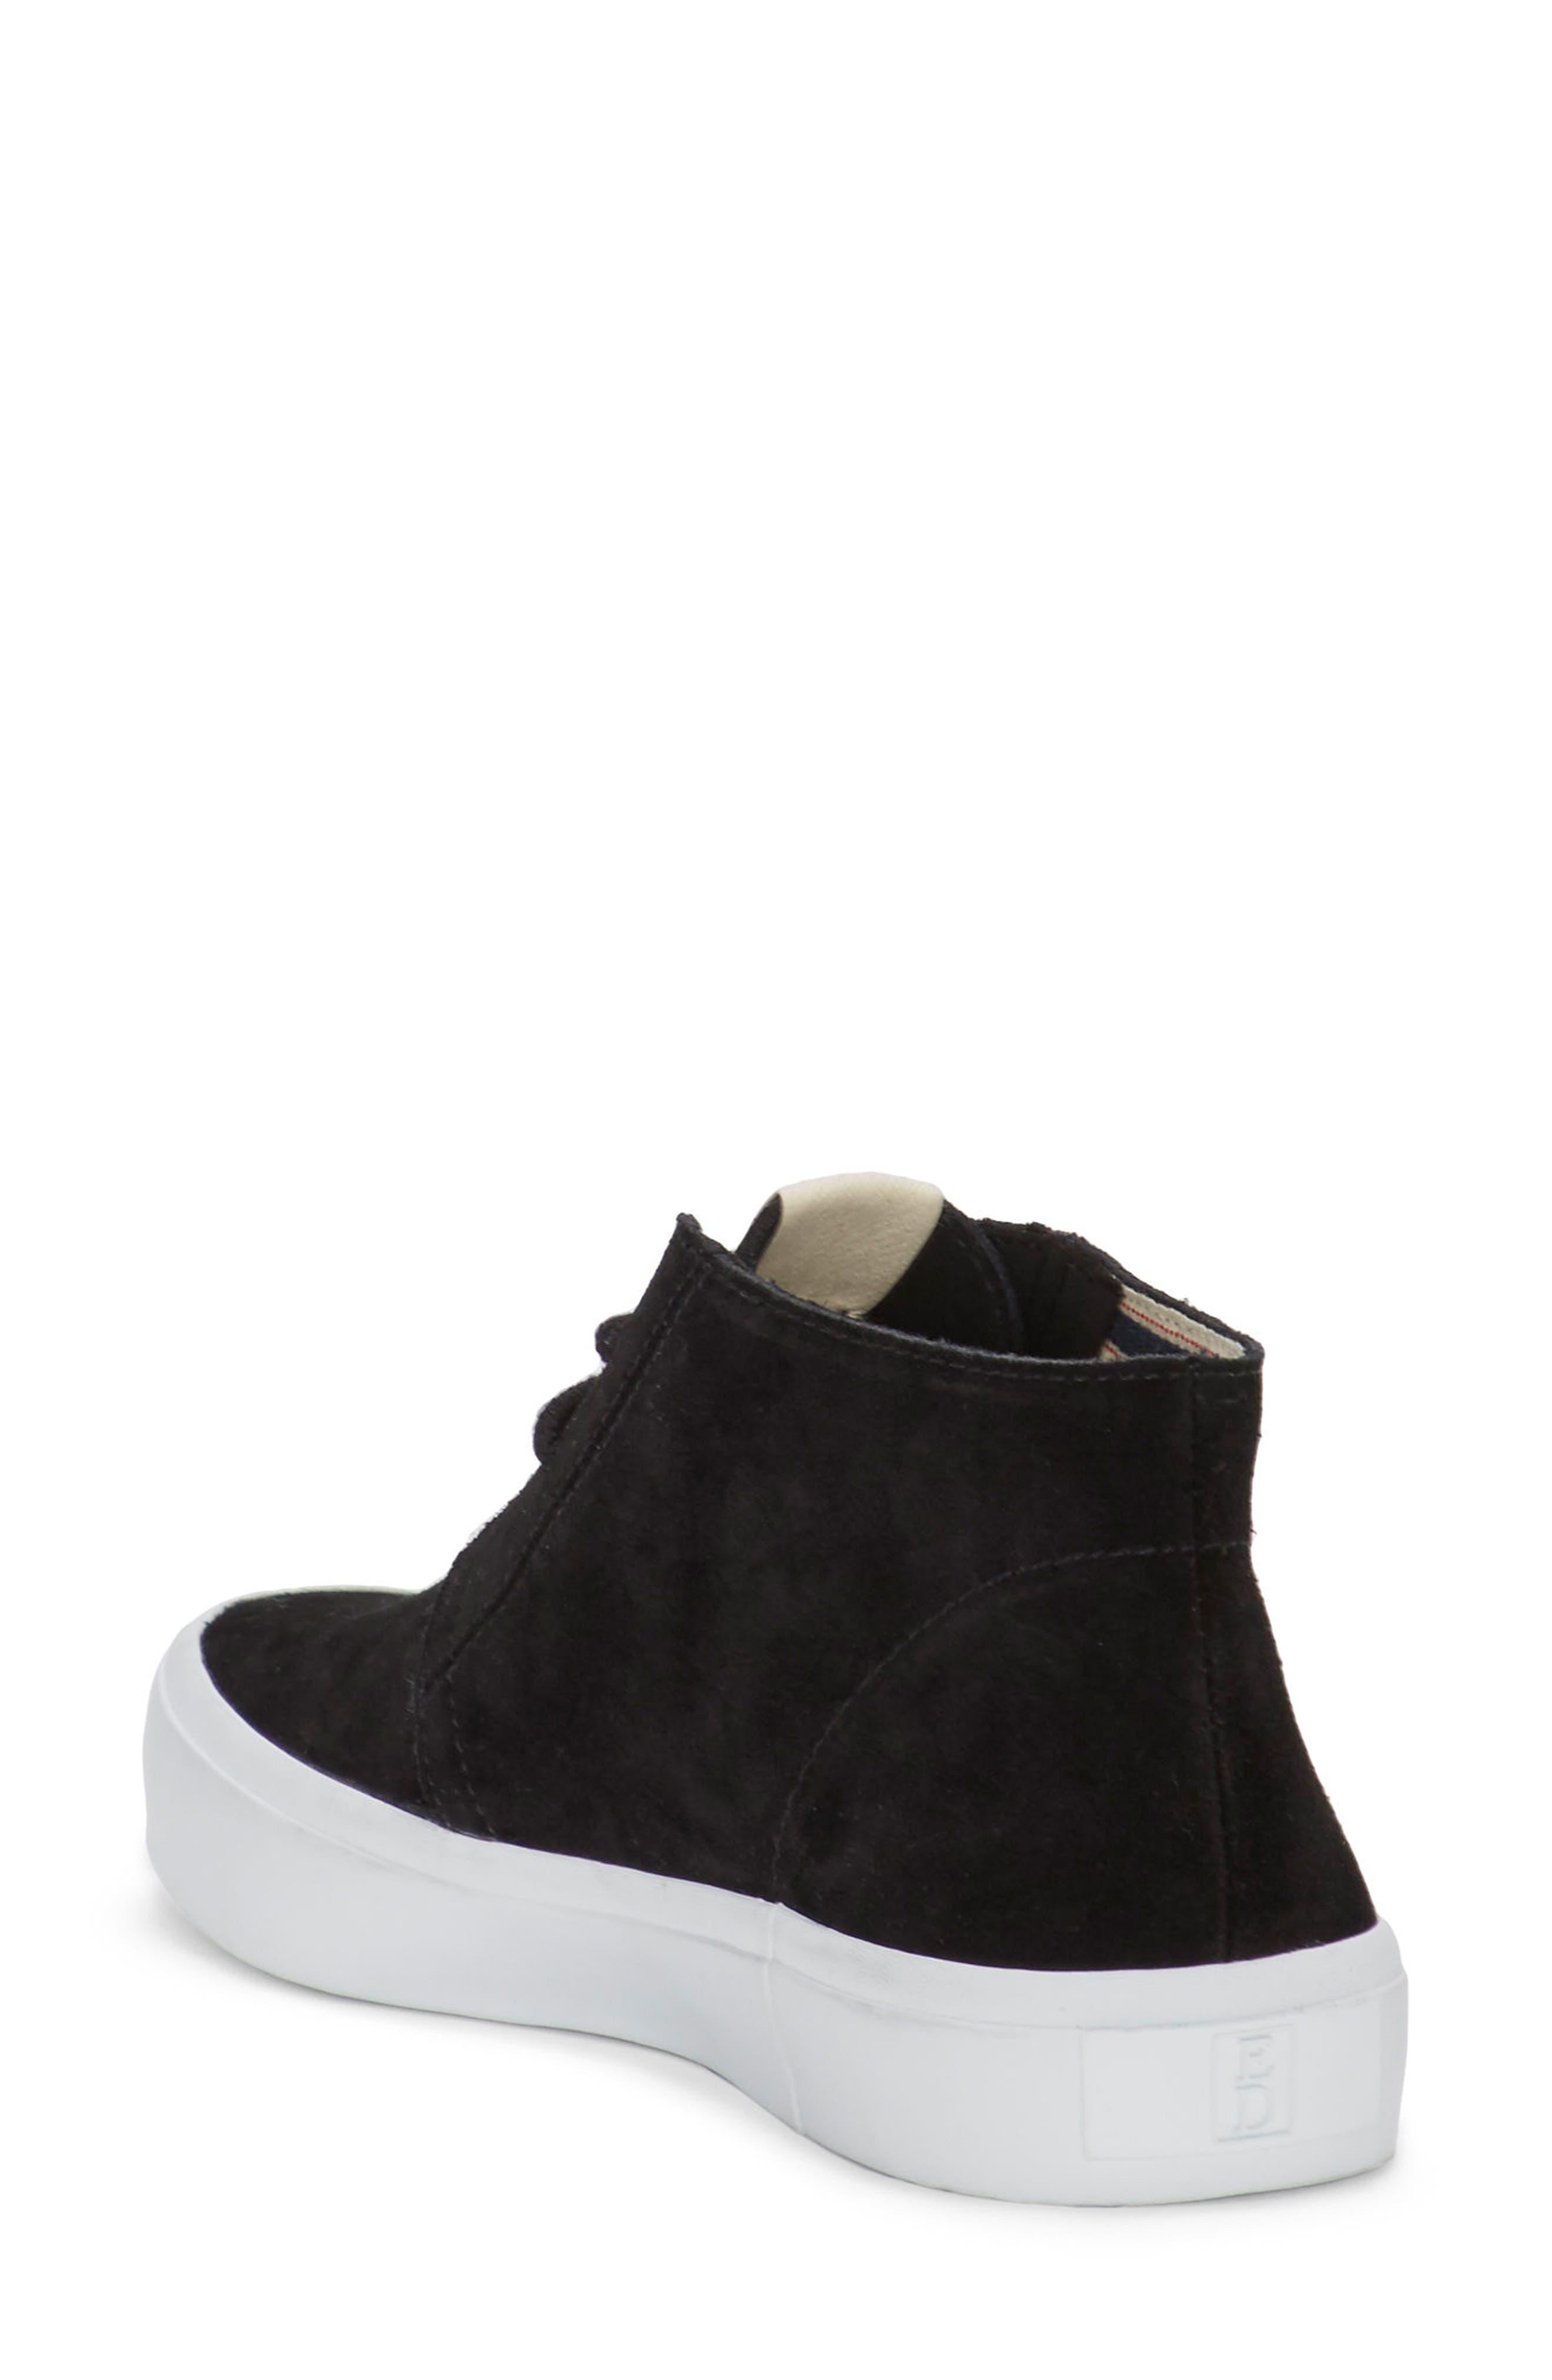 Dax Chukka Sneaker,                             Alternate thumbnail 2, color,                             002